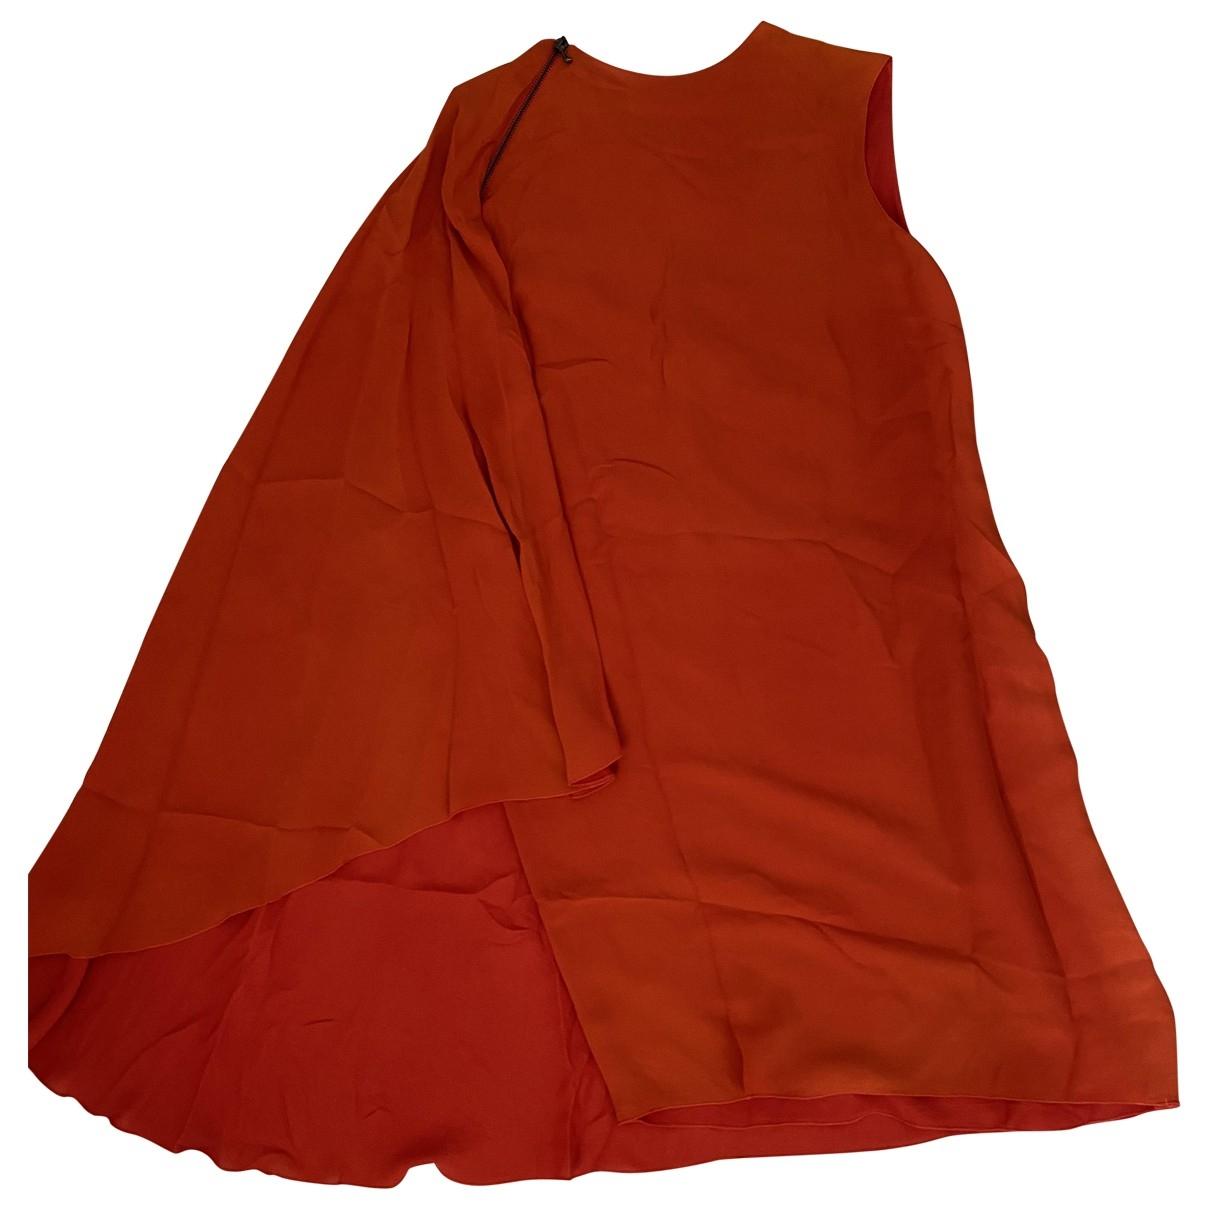 Lanvin \N Orange Silk dress for Women 38 FR